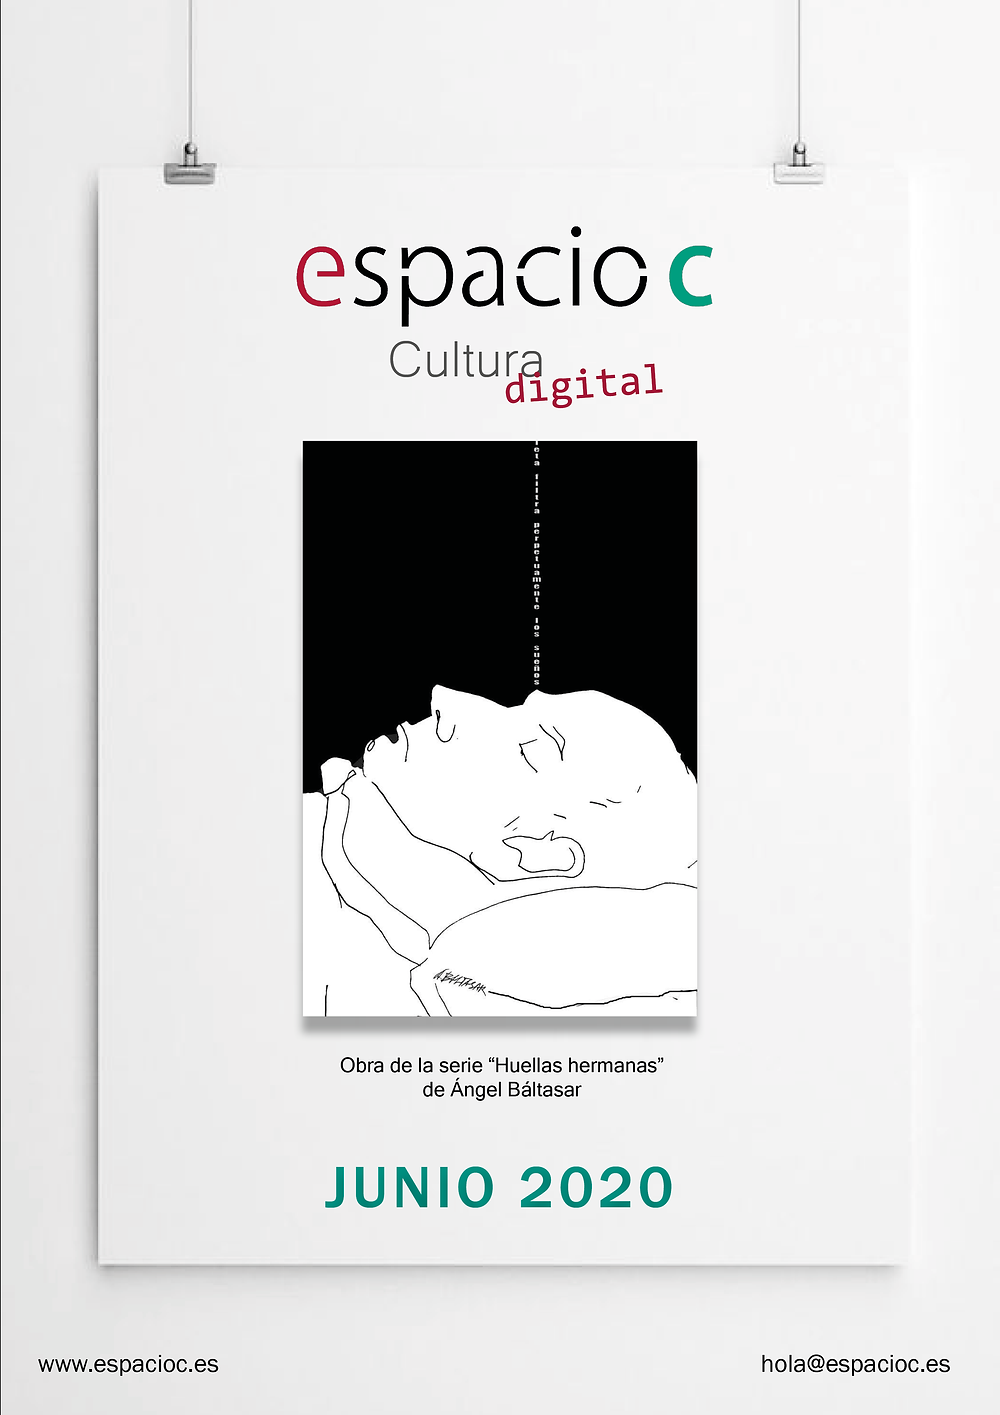 Cultural Digital de Espacio C